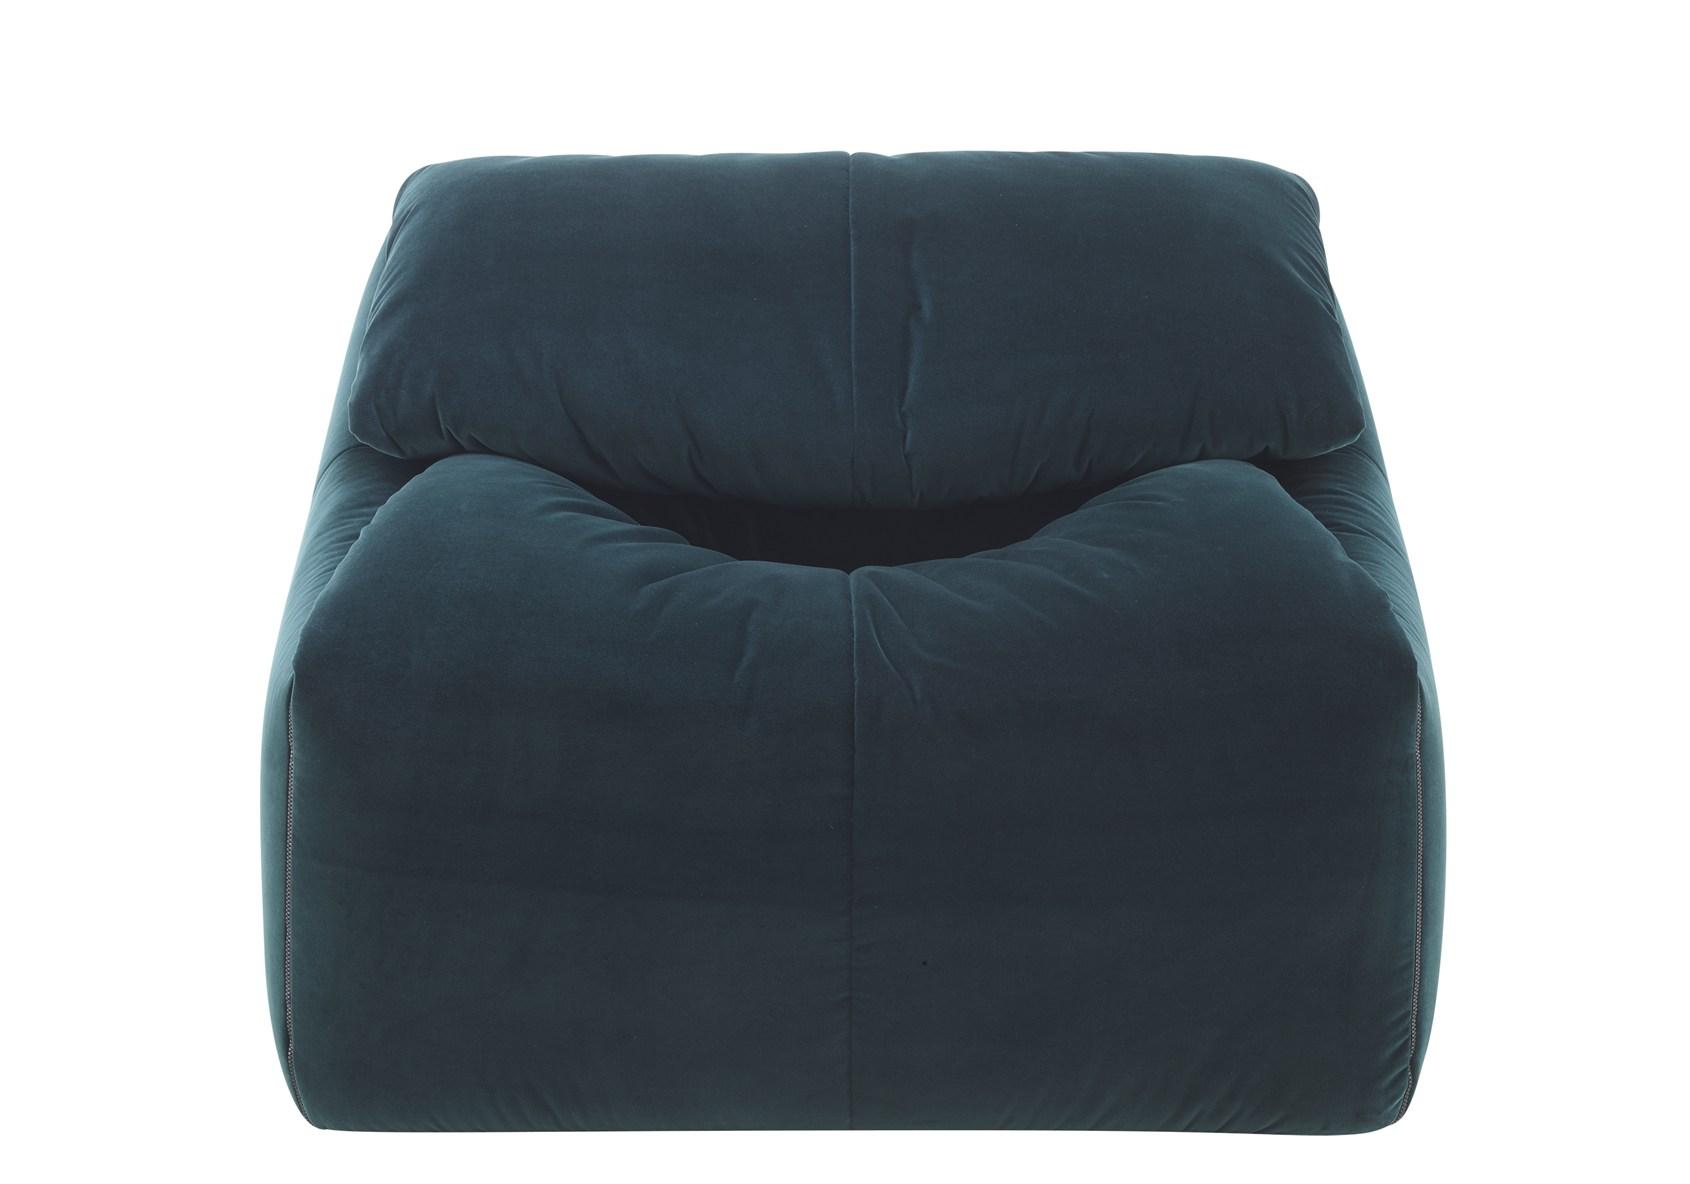 timeless design plumy sofa by annie hi ronimus for ligne. Black Bedroom Furniture Sets. Home Design Ideas